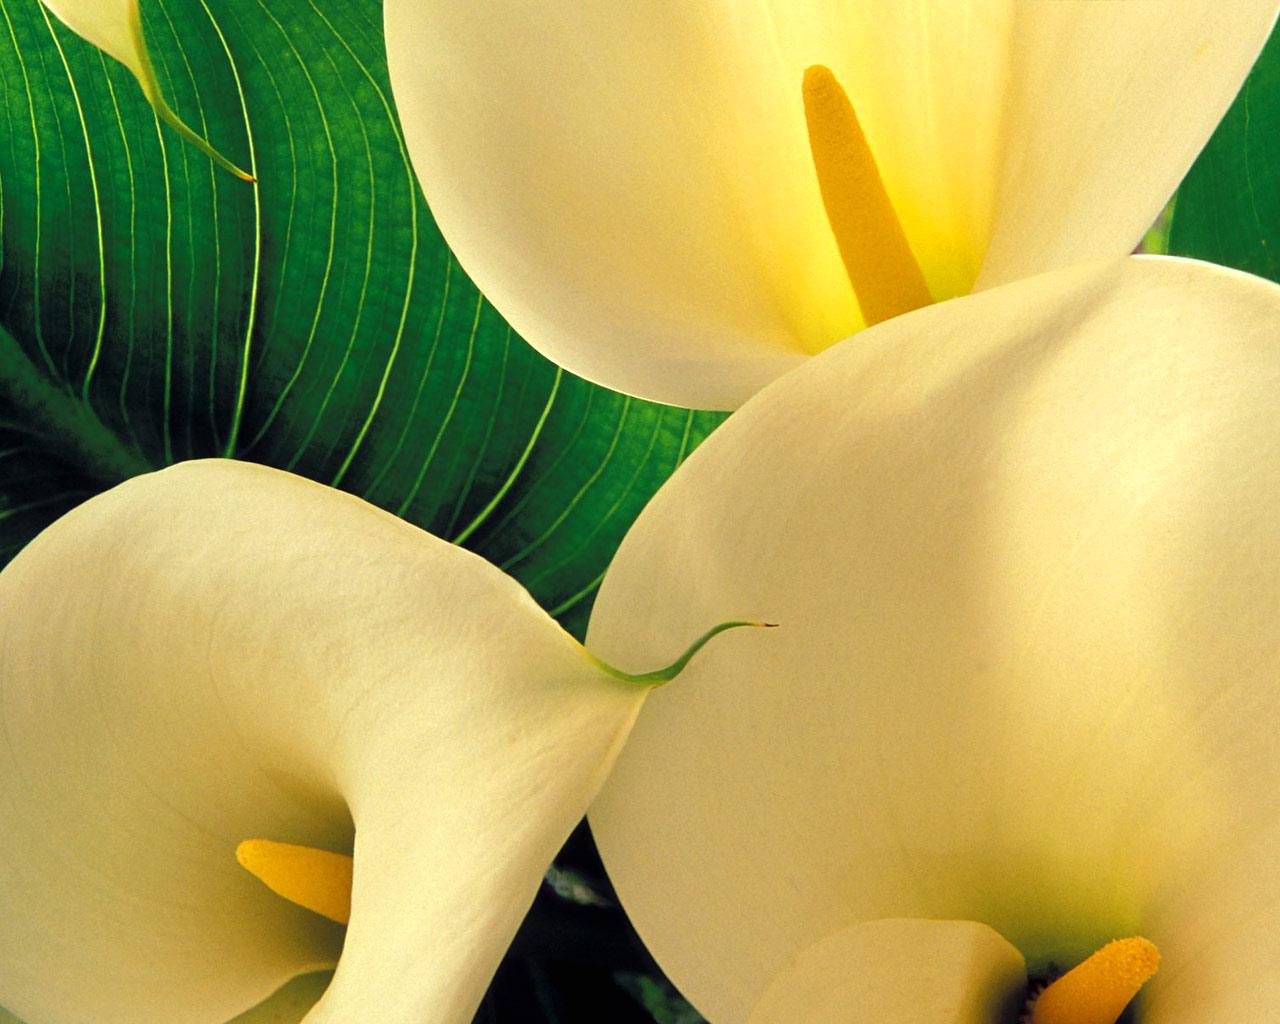 http://4.bp.blogspot.com/-2JNzECBBdt0/TWI3djjRDlI/AAAAAAAAByk/dBYyDvCupHs/s1600/Yellow-Calla-Lilies.jpg